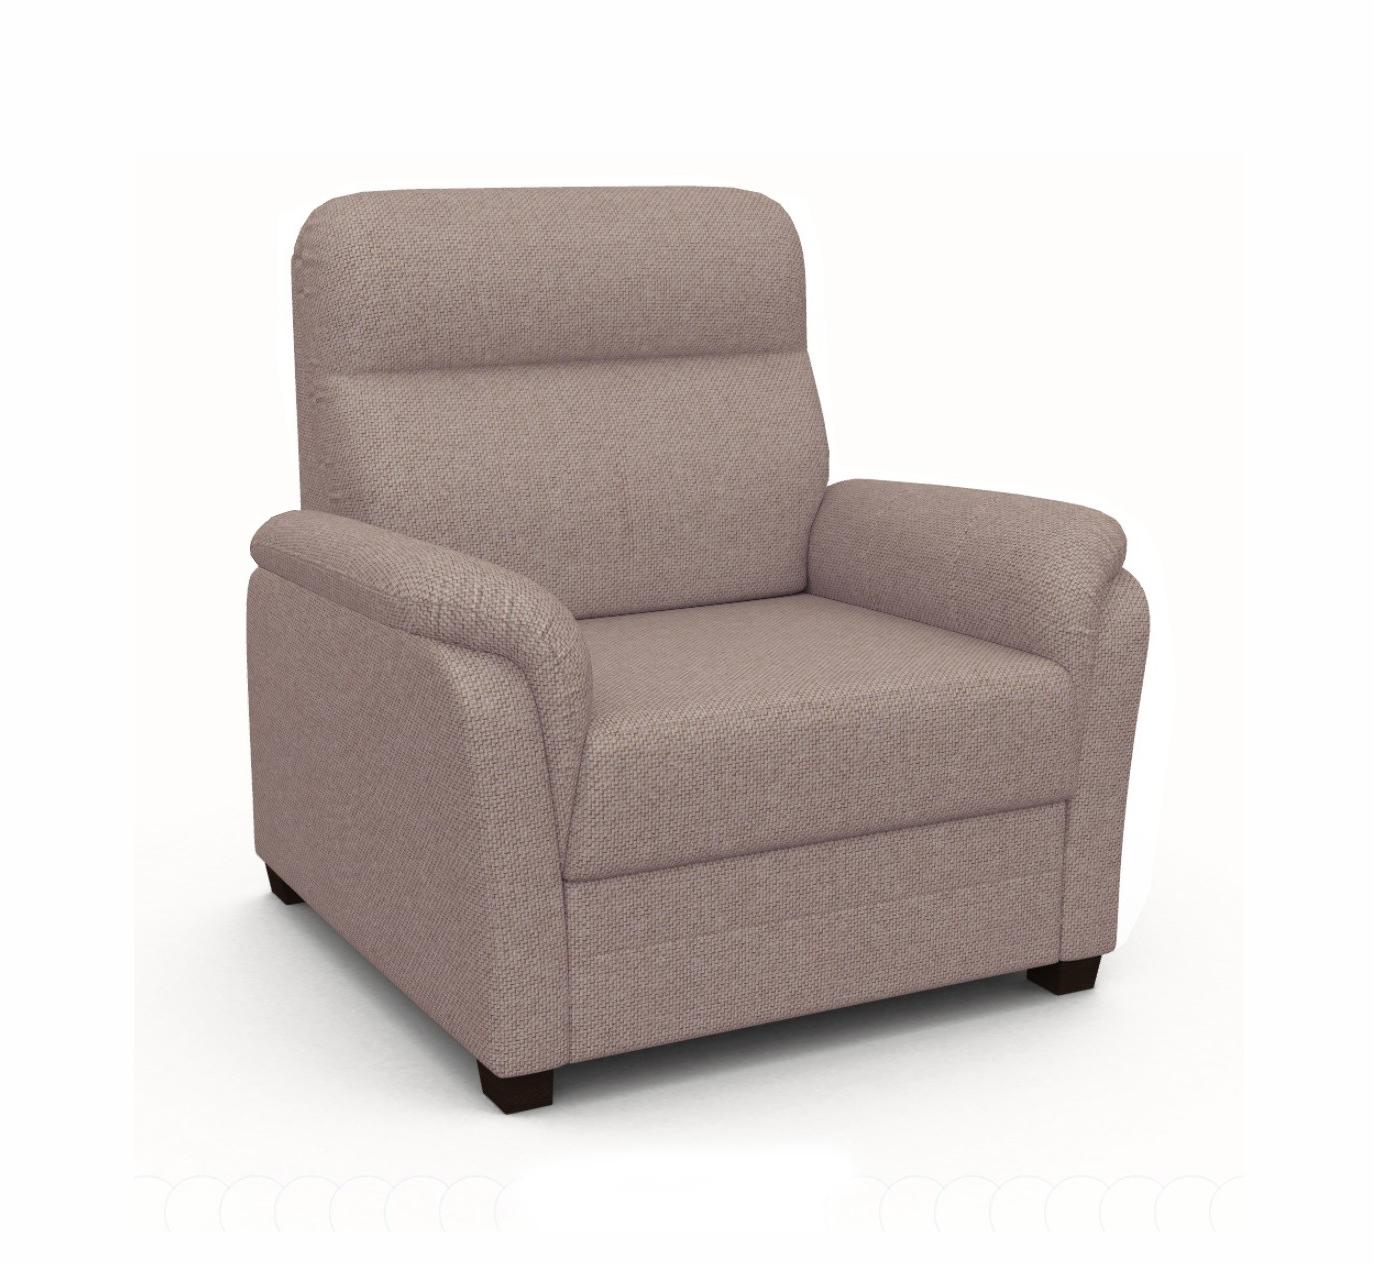 Подвесное кресло Боровичи 16080363 от mebel-top.ru